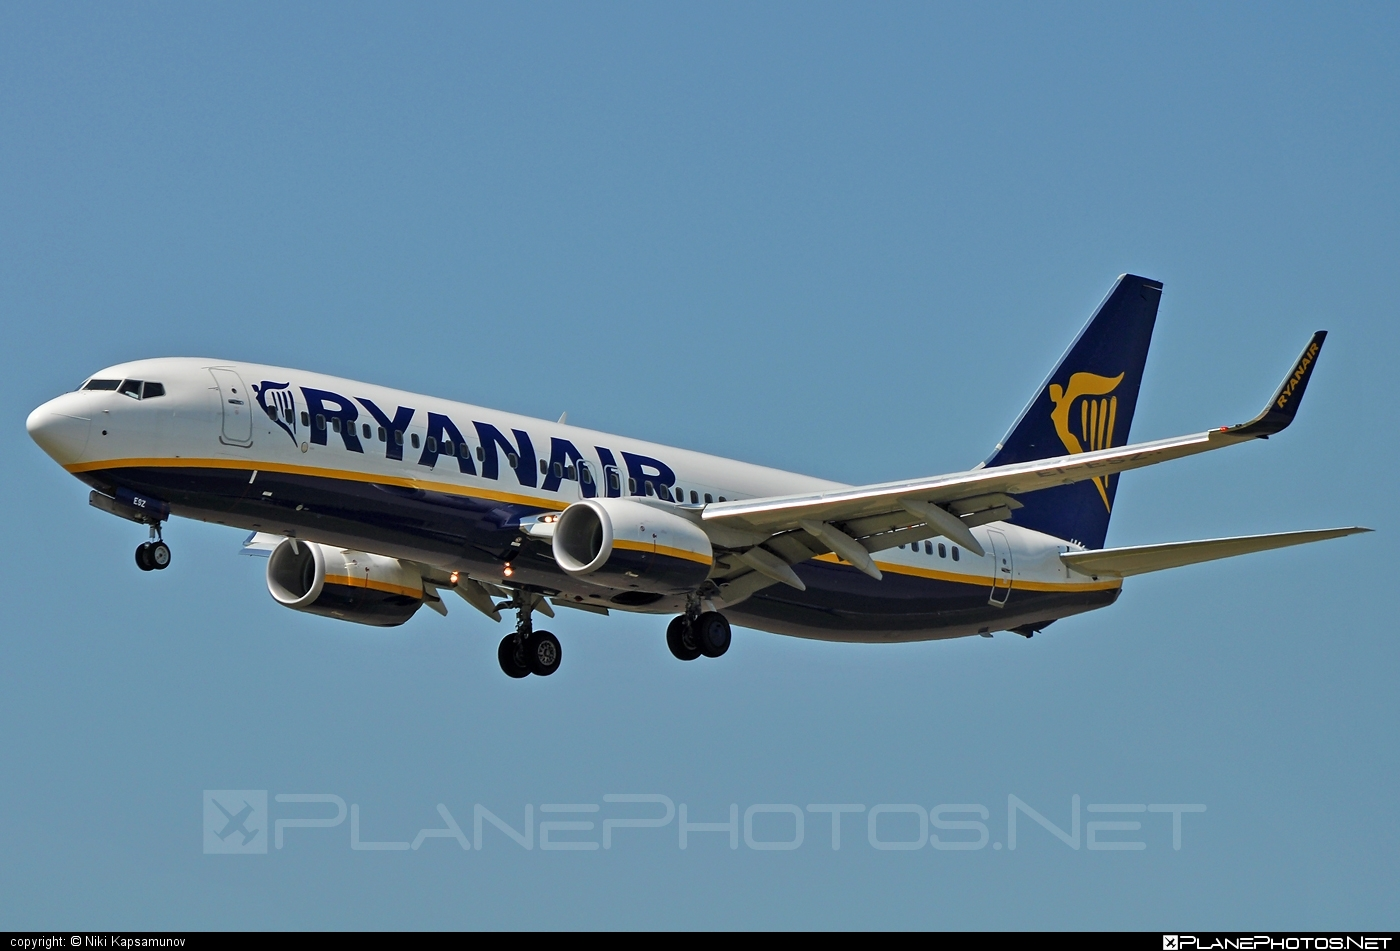 Boeing 737-800 - EI-ESZ operated by Ryanair #b737 #b737nextgen #b737ng #boeing #boeing737 #ryanair